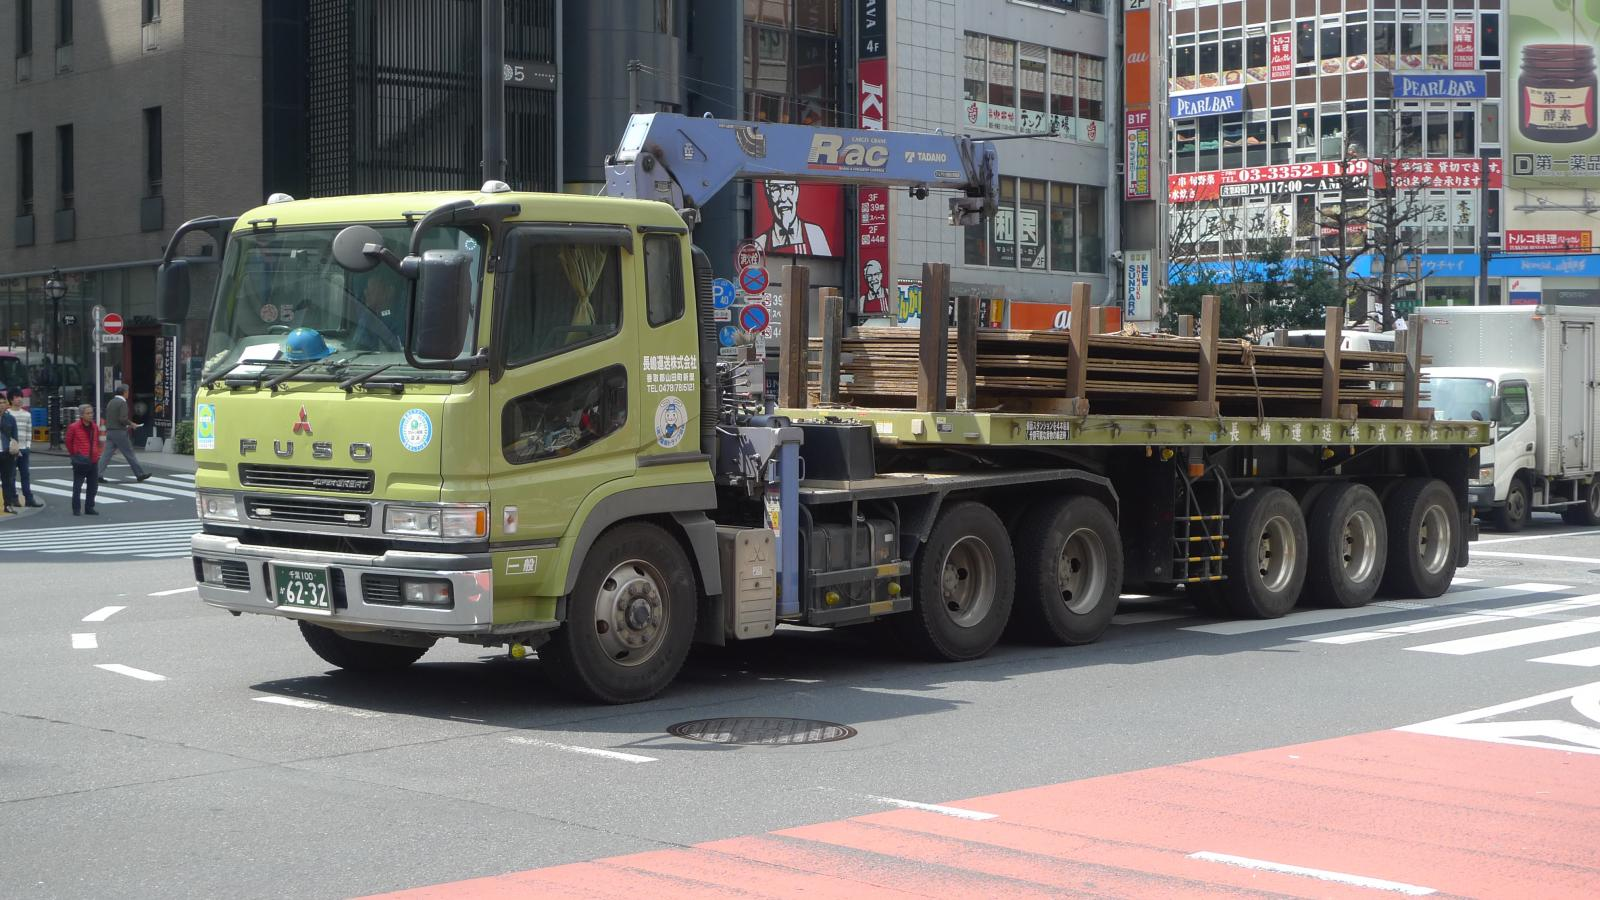 P1070925.JPG